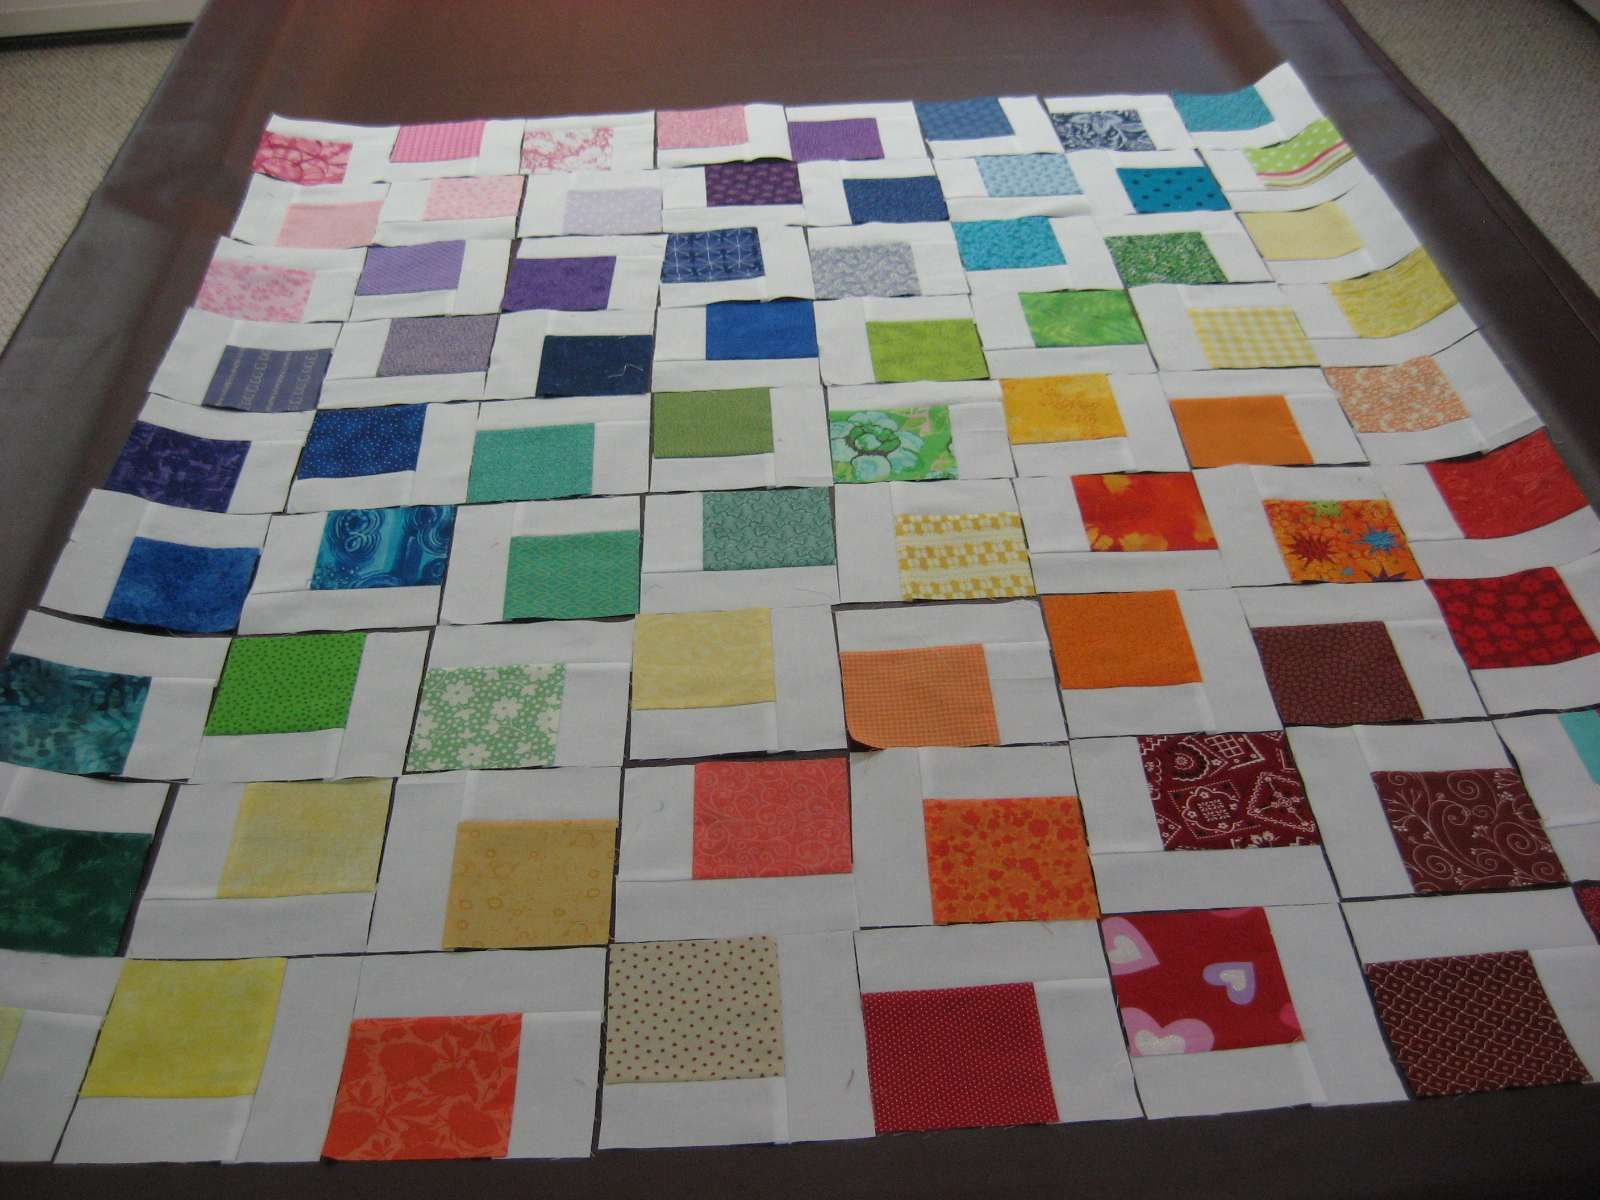 Rainbow Quilt ~ A Picture Tutorial | Quilting | Pinterest ... : rainbow quilt pattern - Adamdwight.com